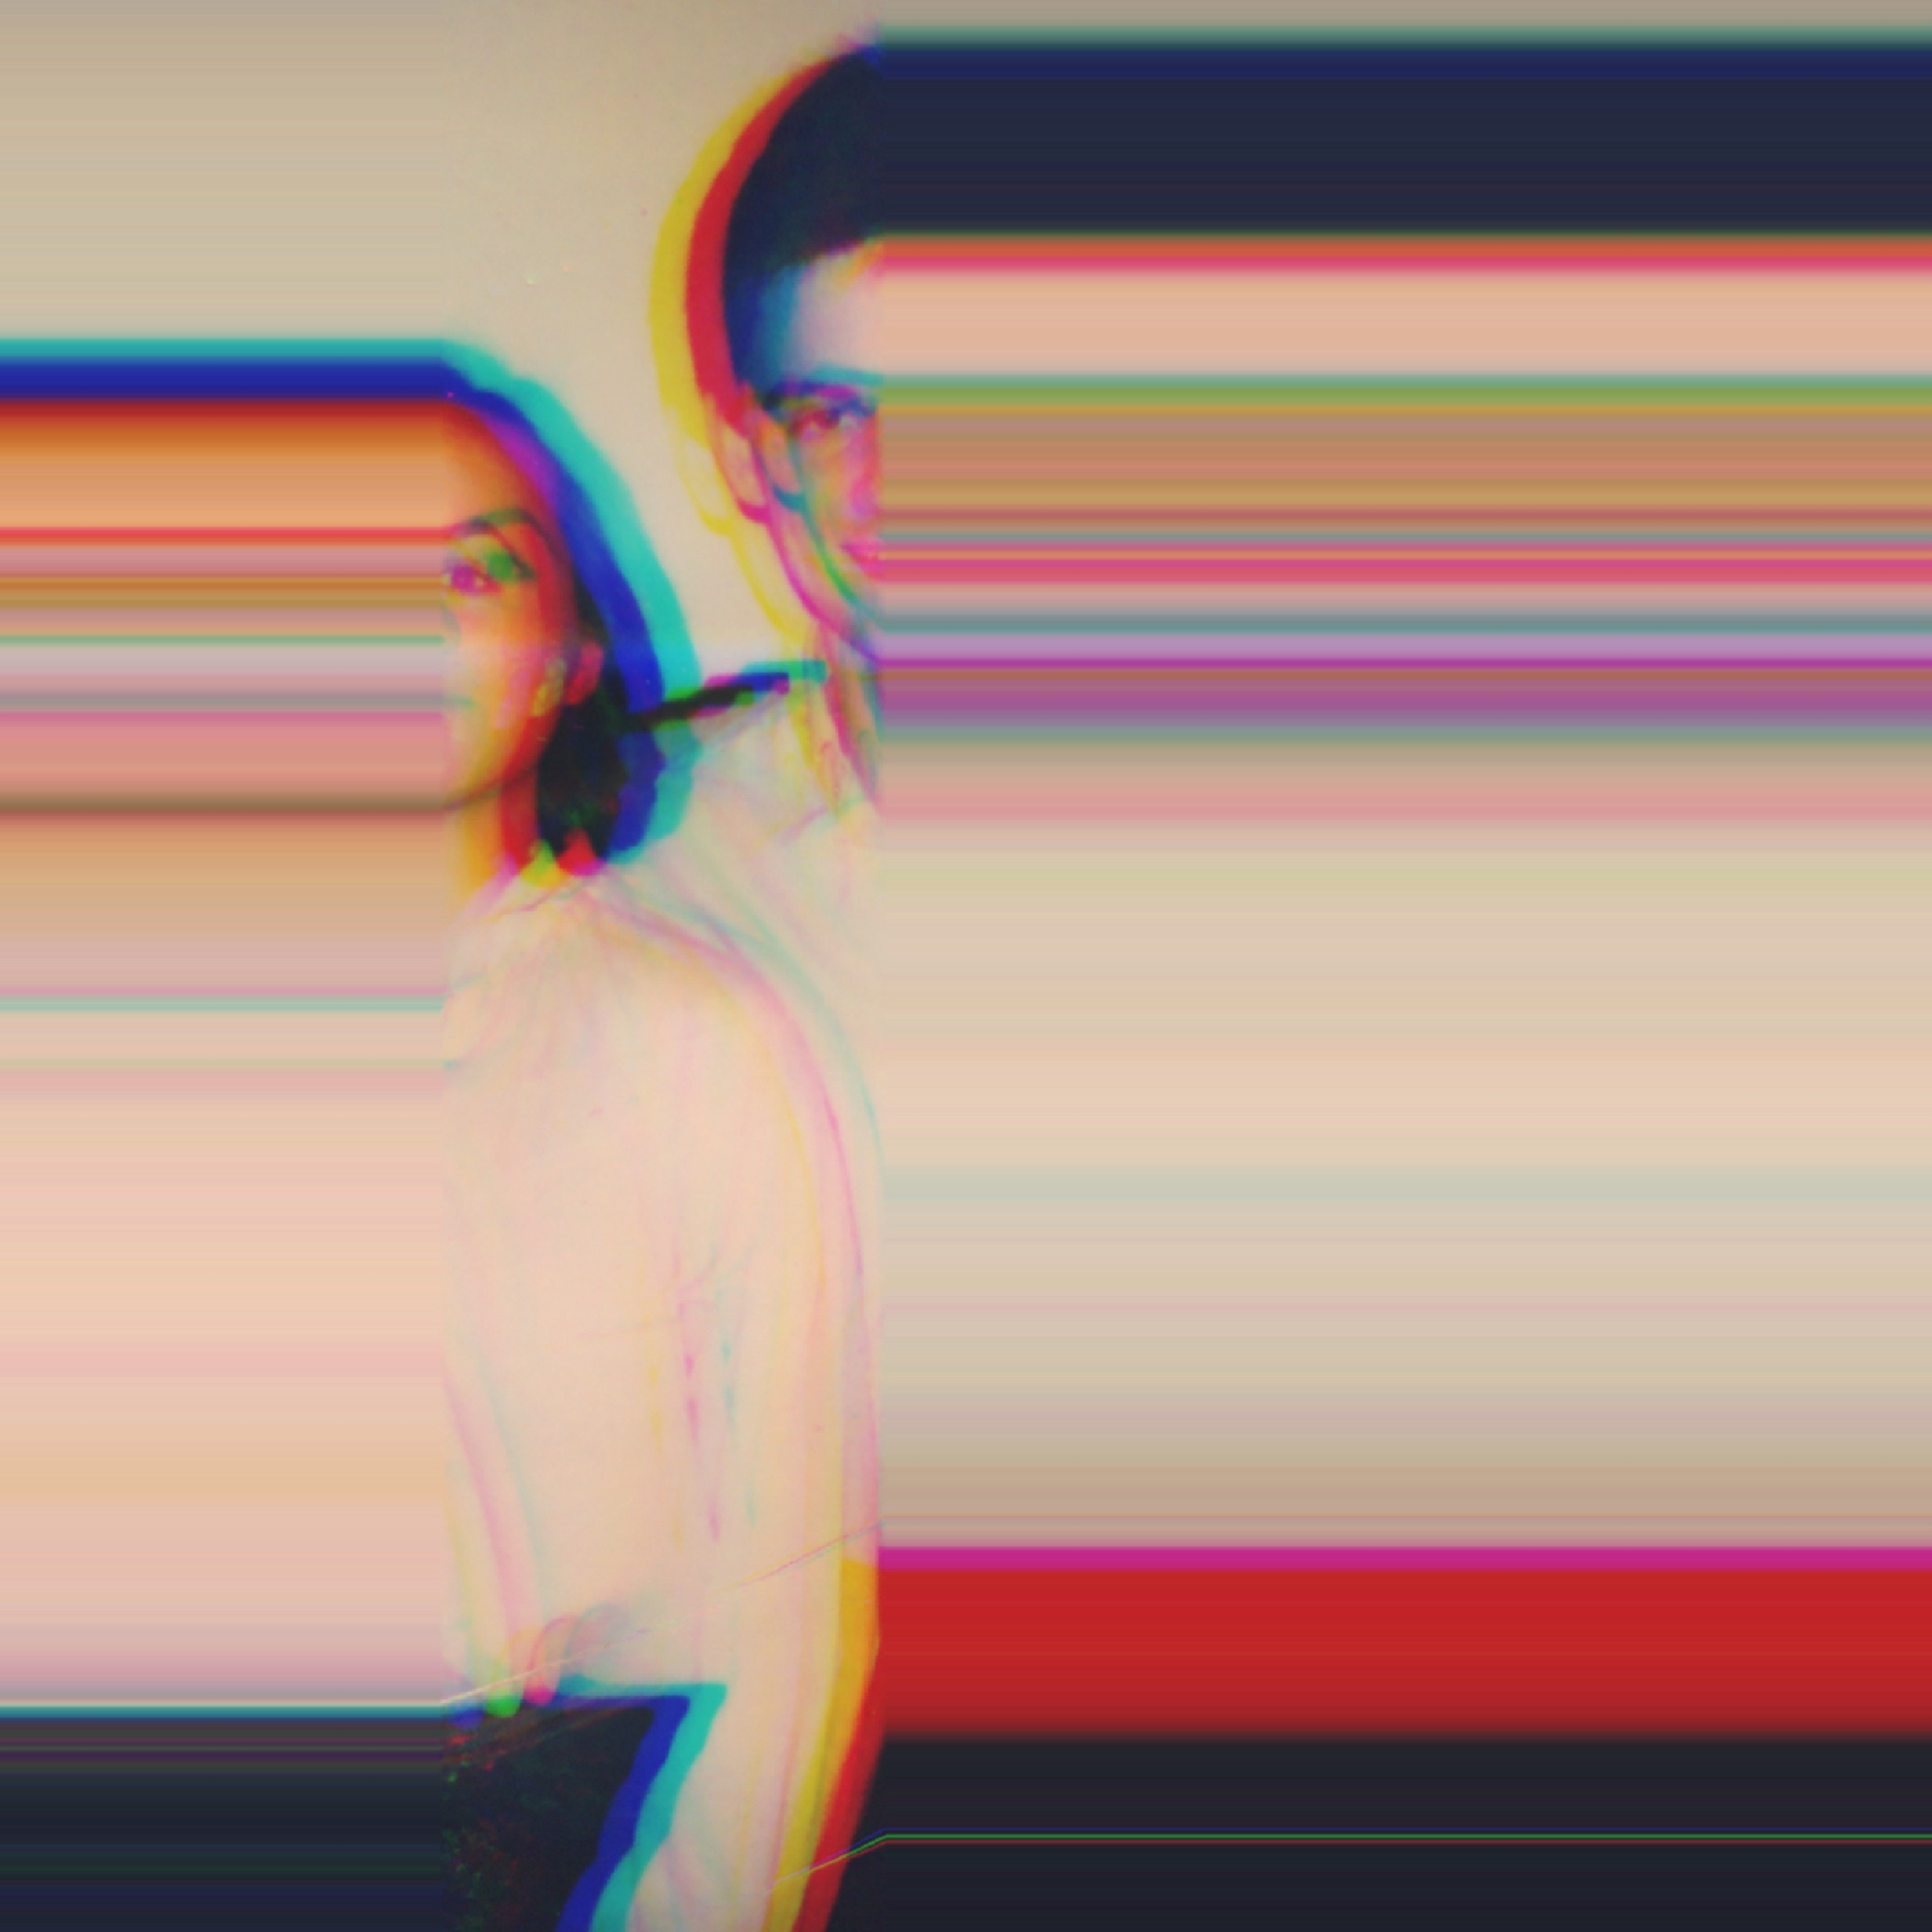 Digital Detritus No. 13    Digitally manipulated image  dimensions variable  2016